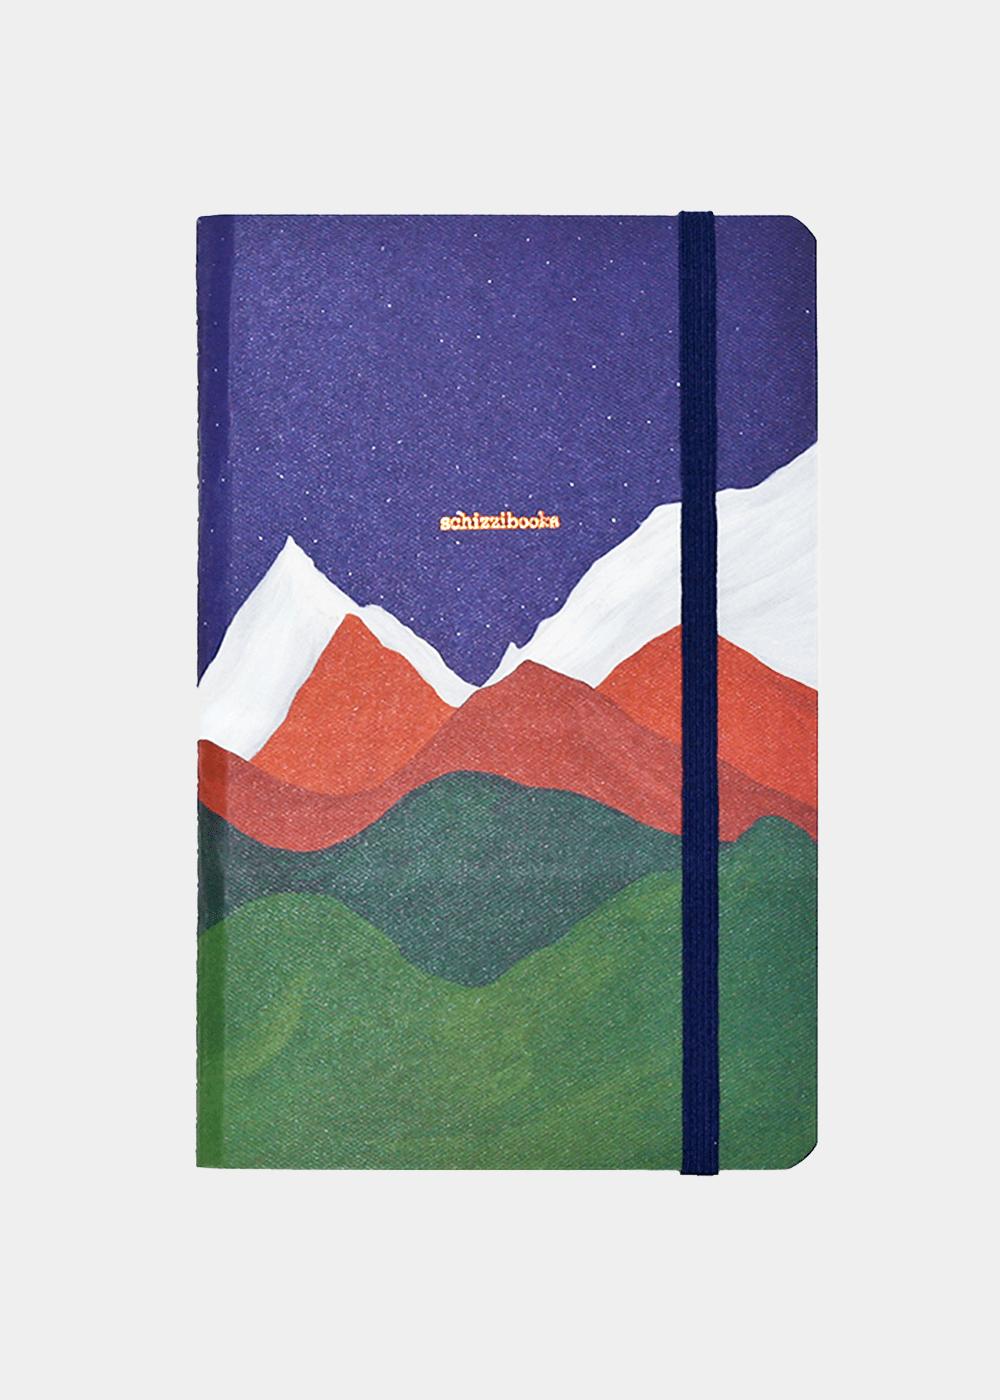 ushuais-large